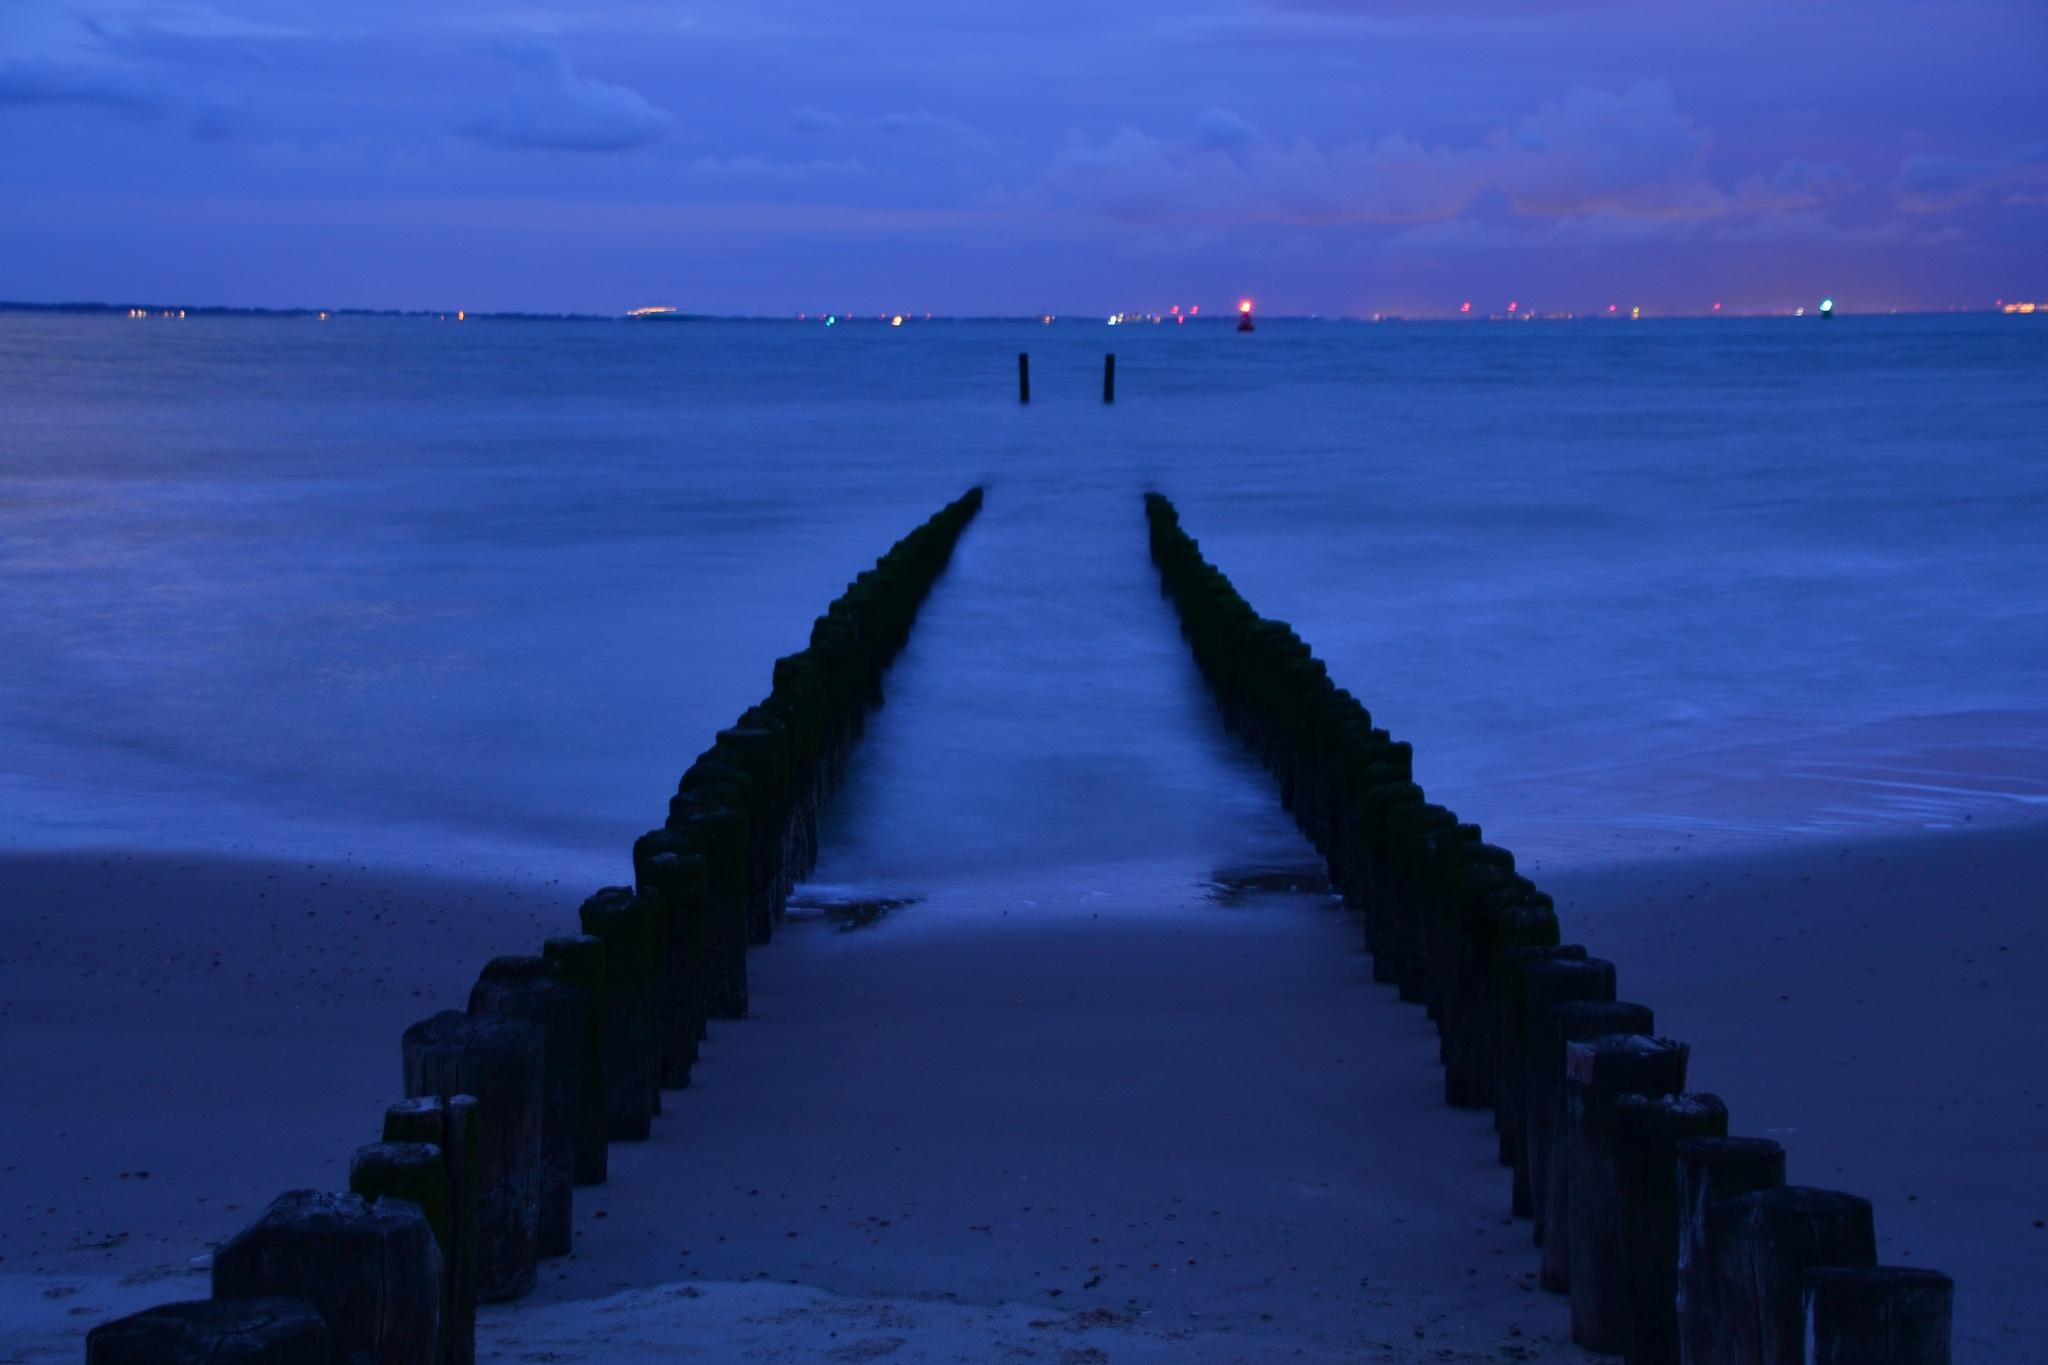 Late at night by the sea entrance to Westerschelde and Port of Antwerp by daan.hoogendijk